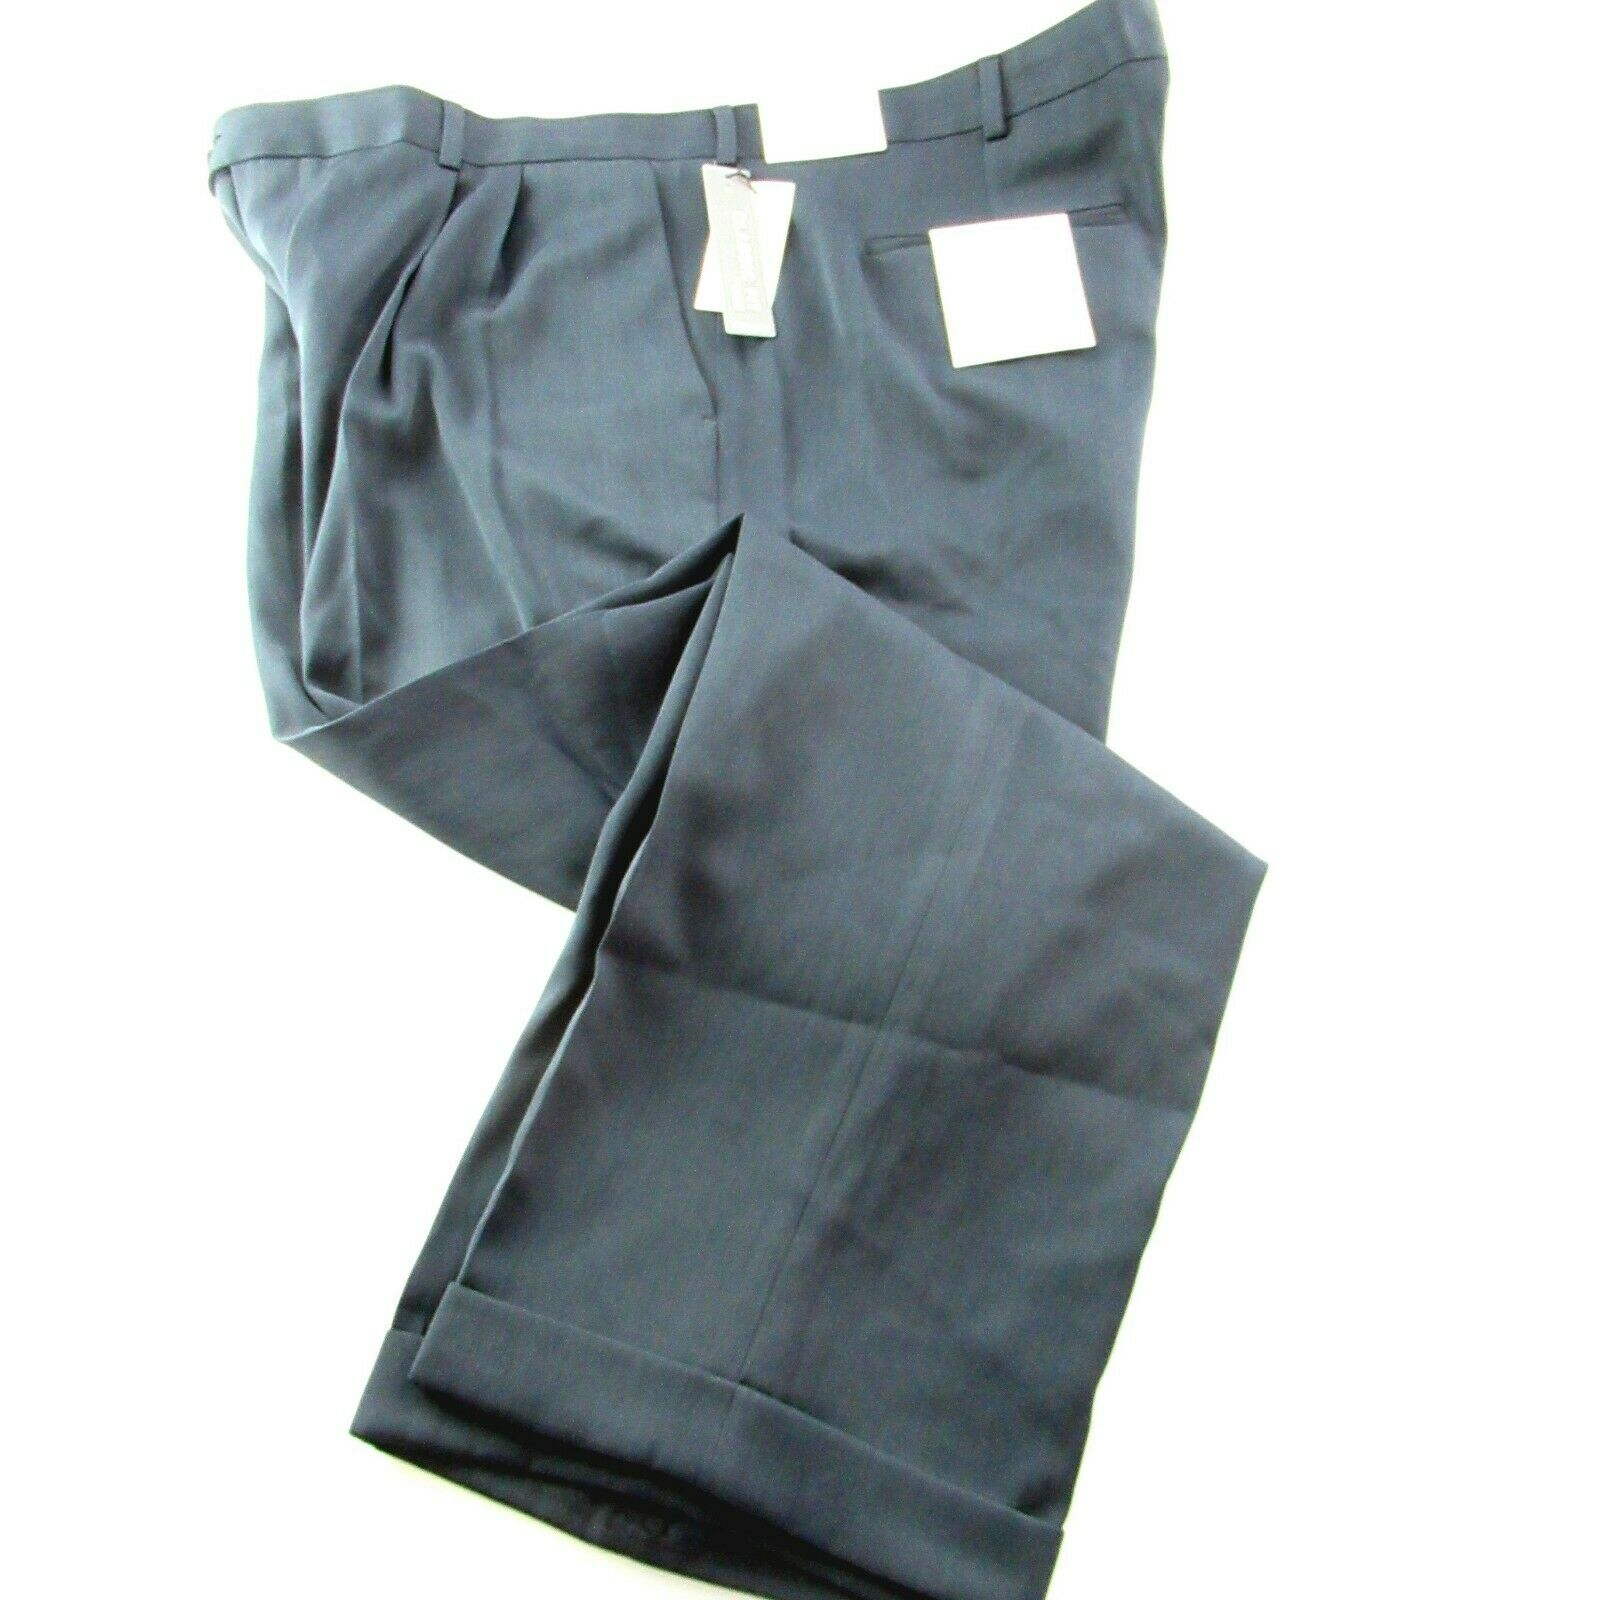 NEW Perry Ellis No Iron Travel Dress Pants Mens 38 x 32 Twilight bluee NWT